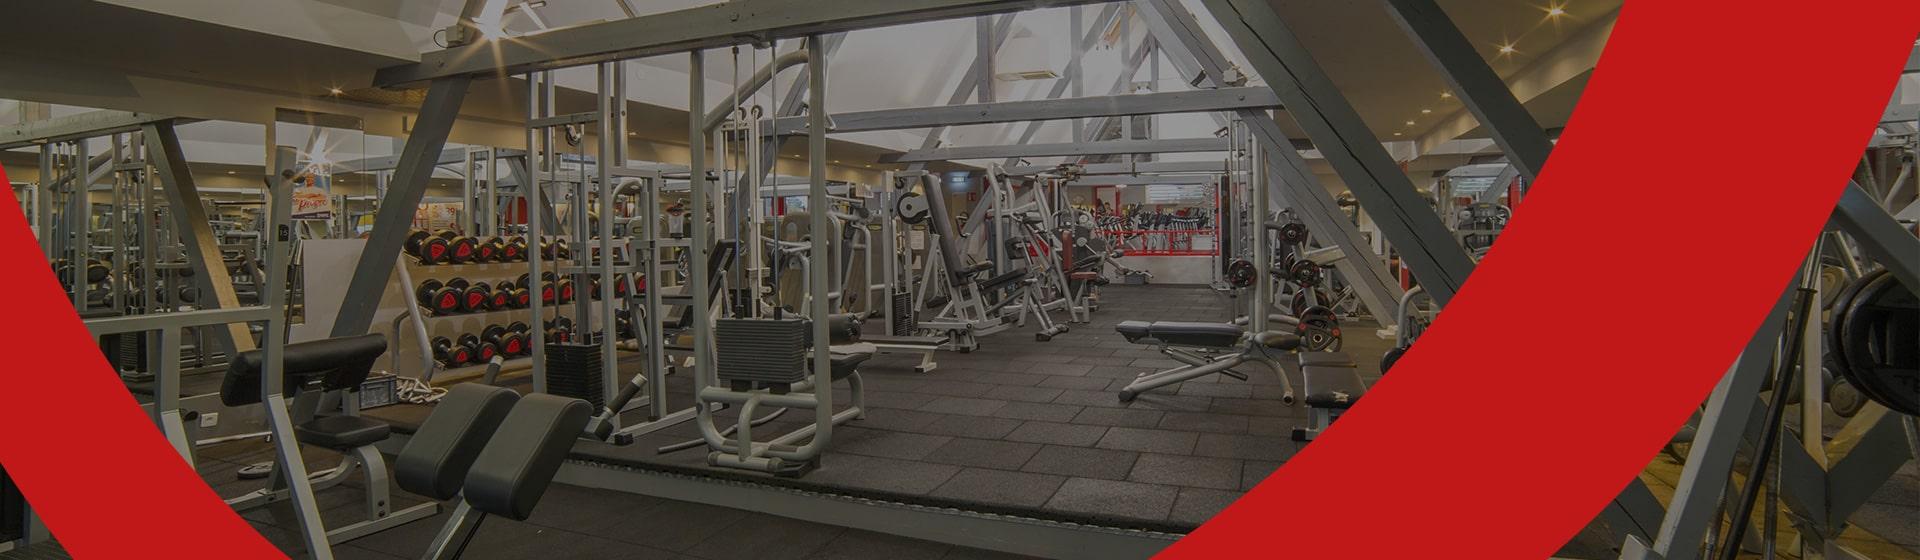 Salle De Sport Flaxlanden gymnase fitness club - votre salle de sport à cernay